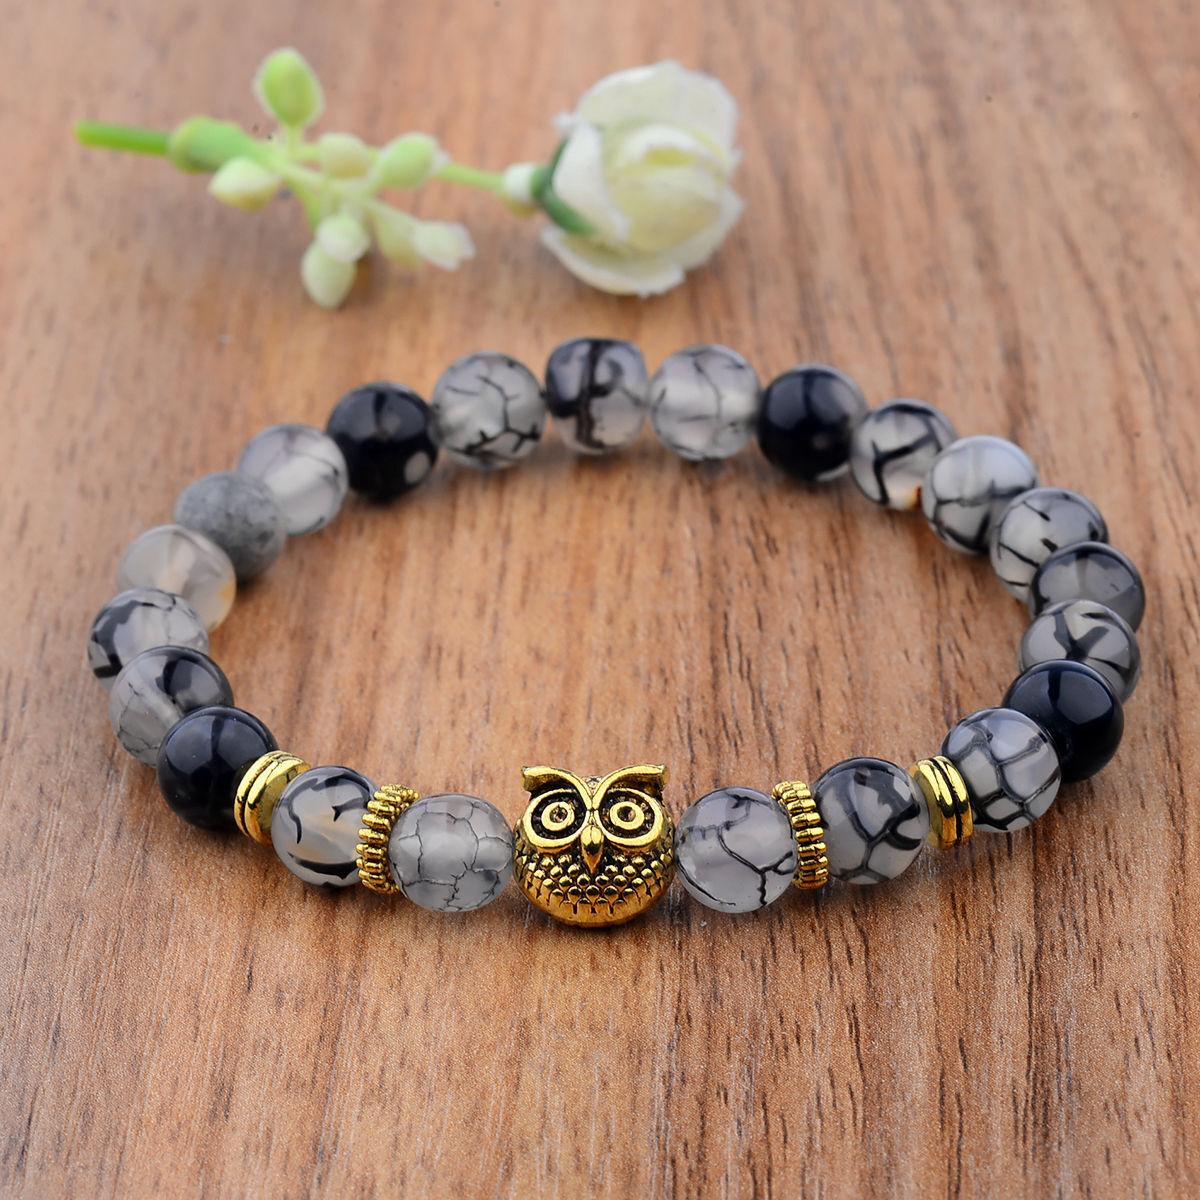 1Pcs Men Women 8MM Gemstone Beaded Braided Bracelets Charm Fashion Jewelry Gift 11